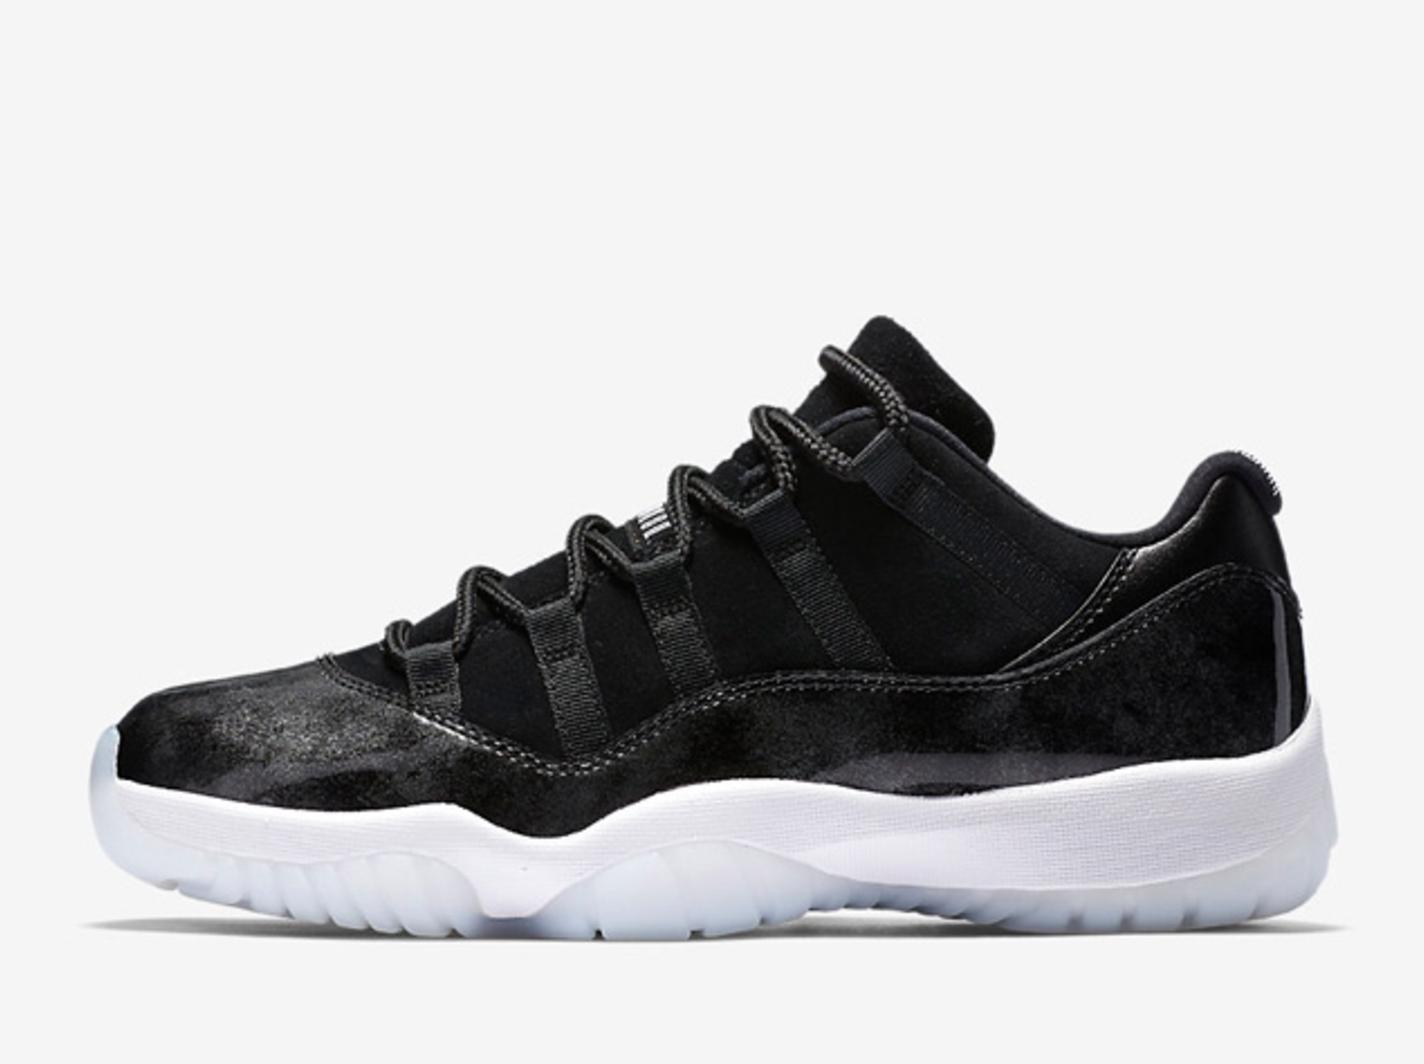 Two Jordan 11 Retro Lows for 2017